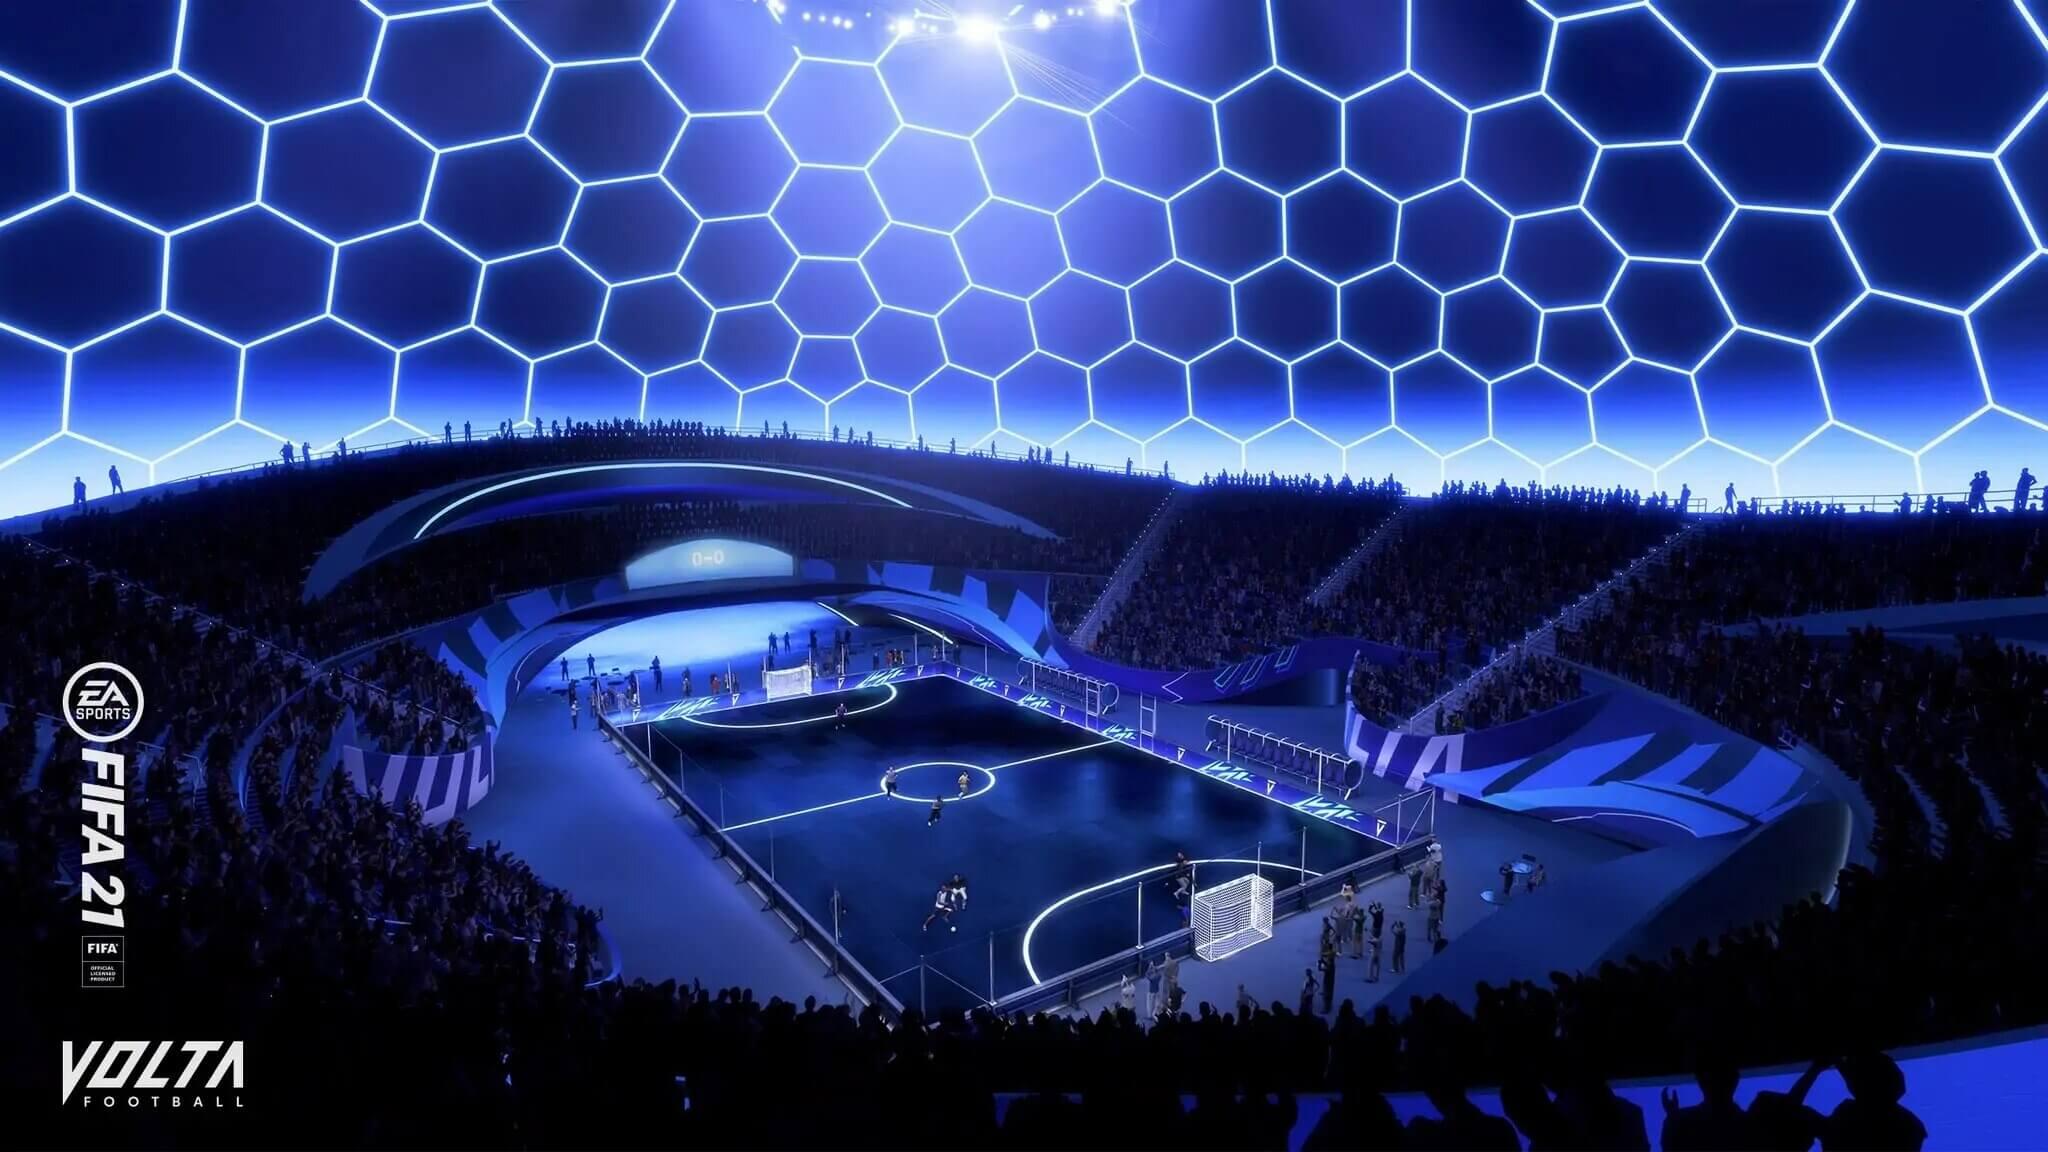 Así será VOLTA FOOTBALL en FIFA 21